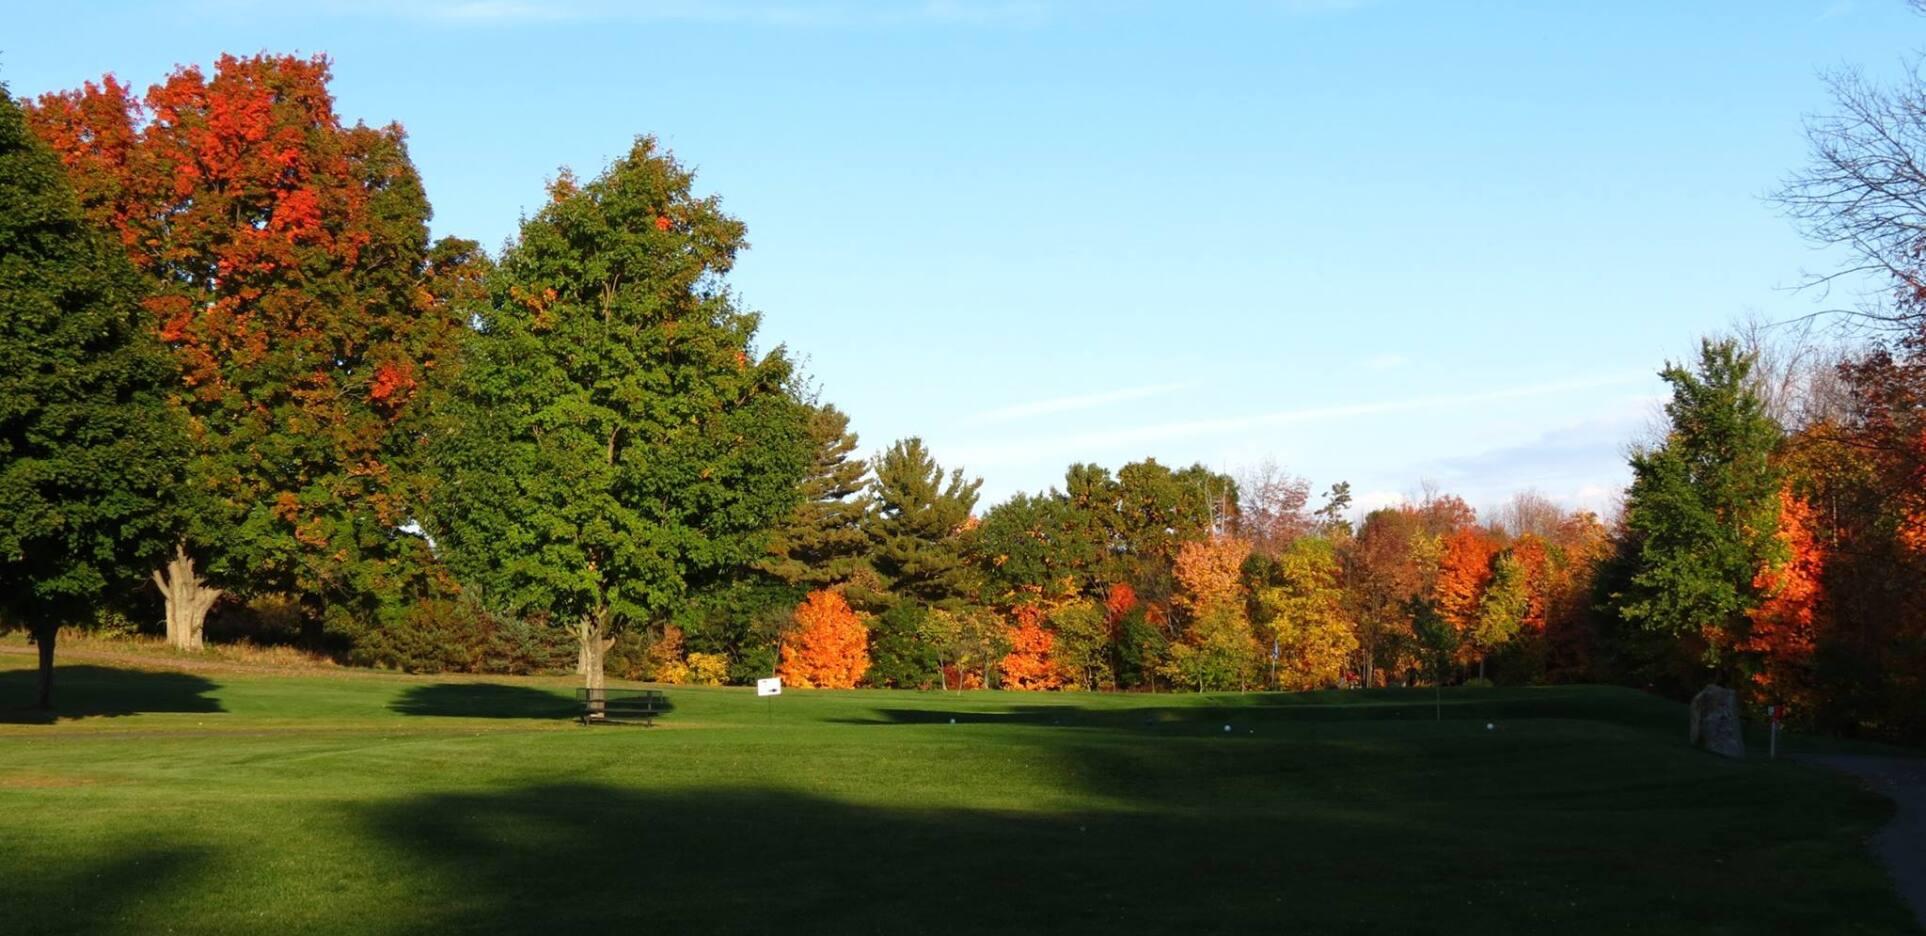 Ely Park Golf Course